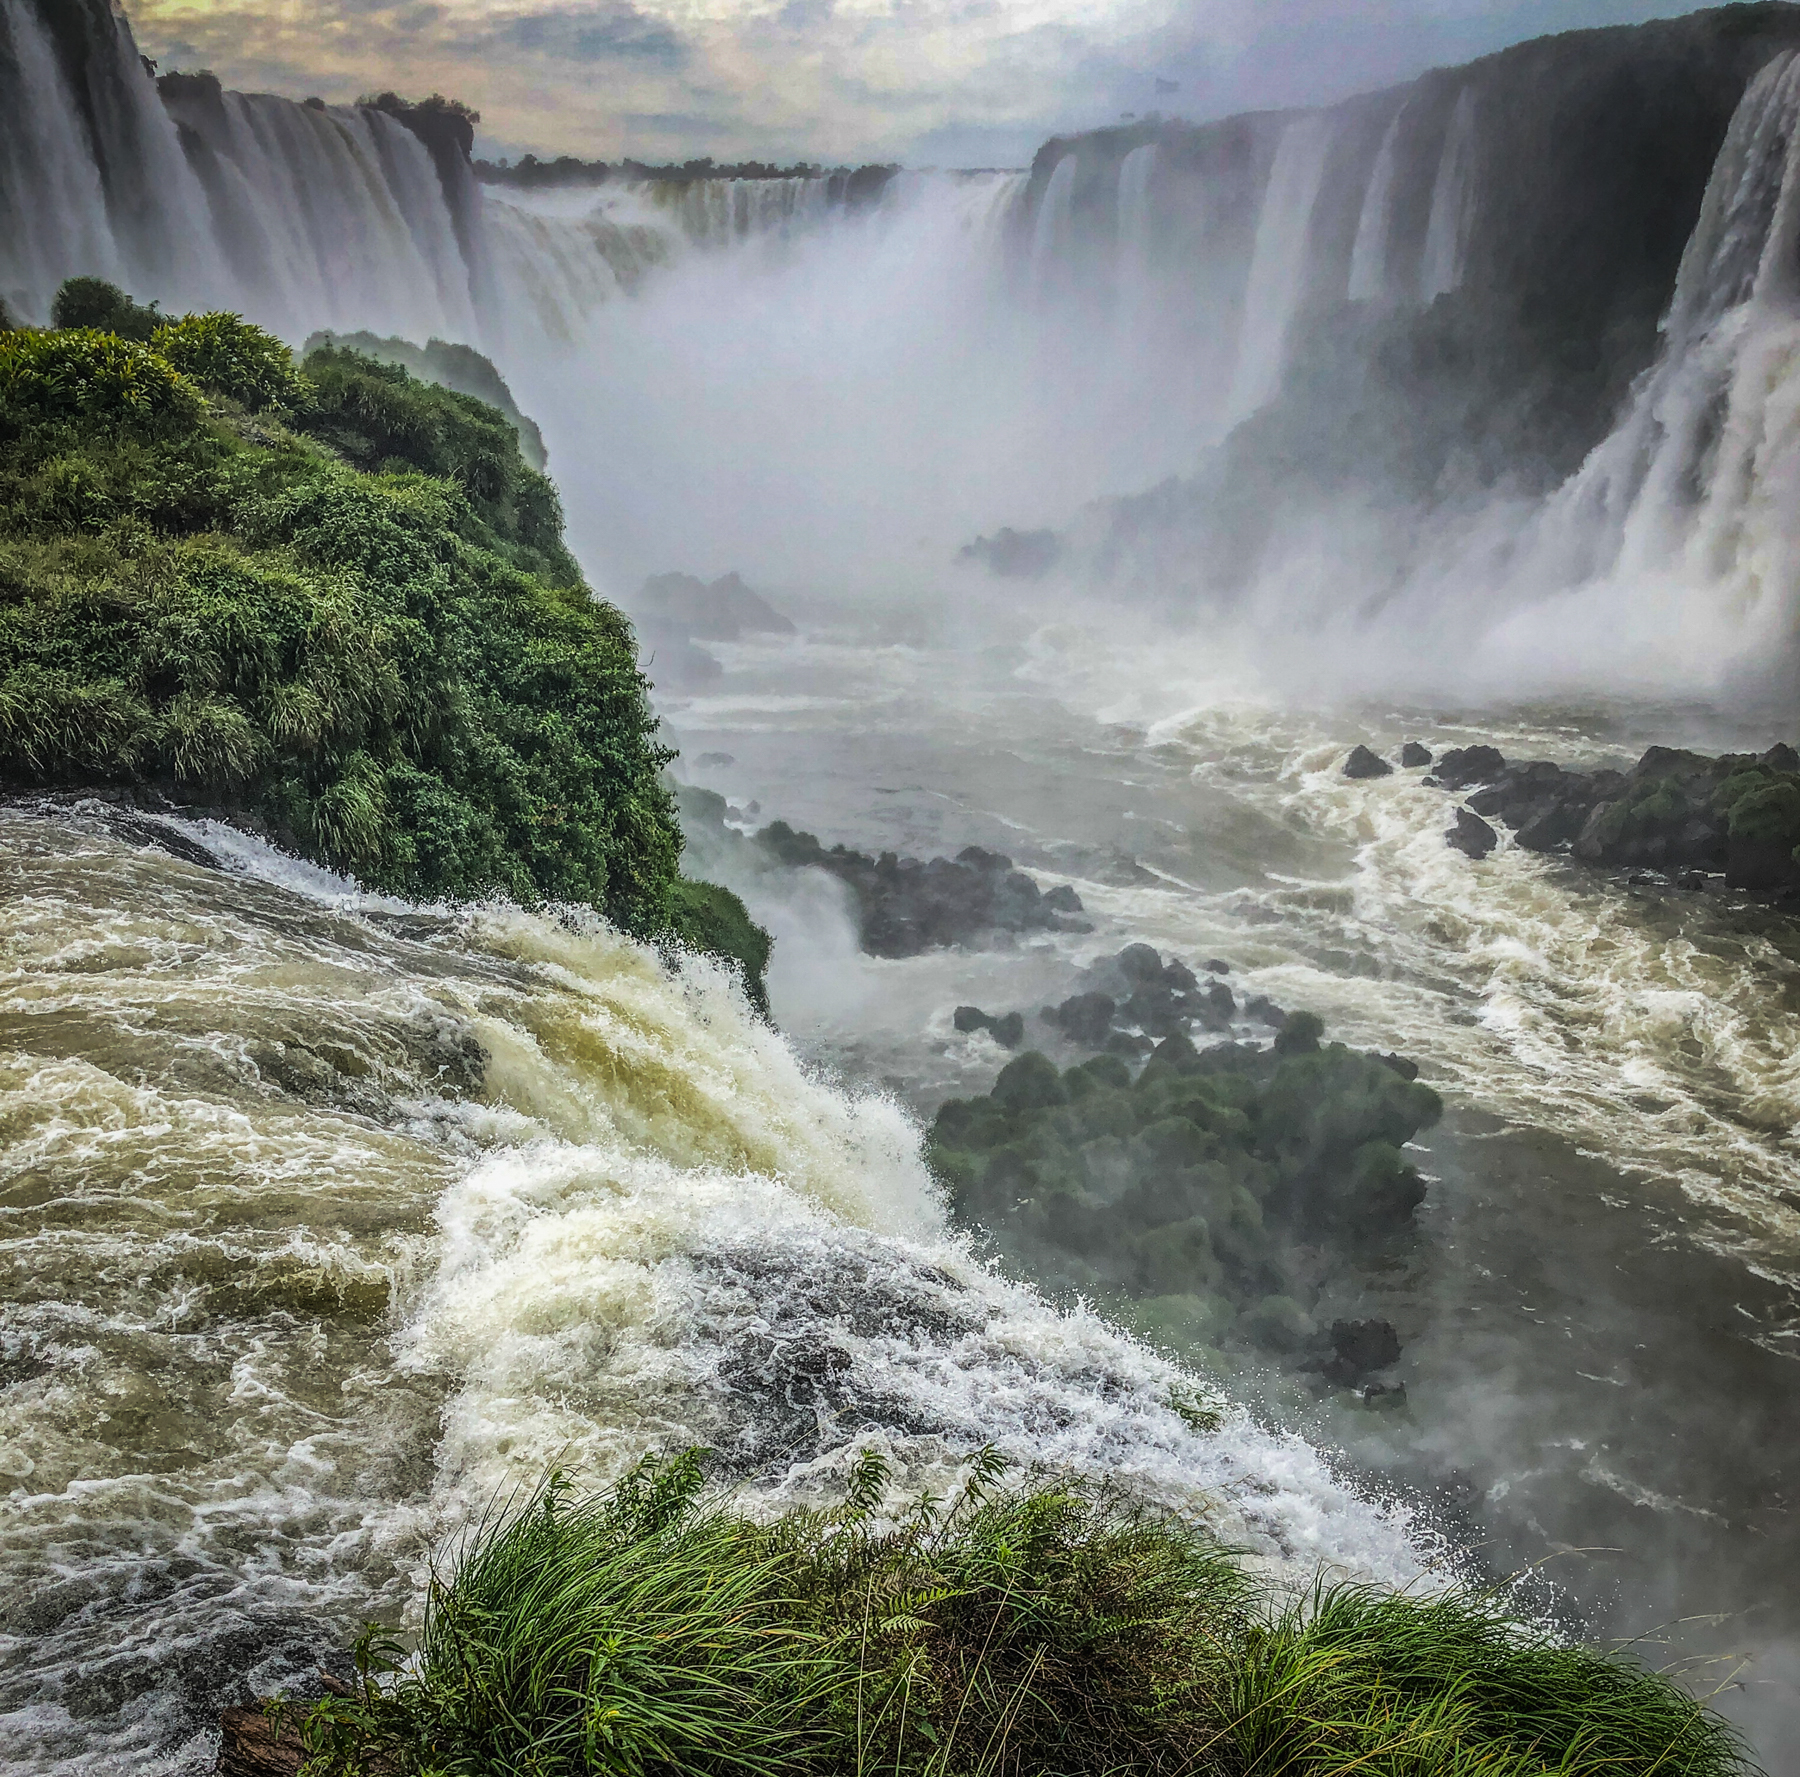 arabella-dane-iguassu-falls-IMG_1088.jpg